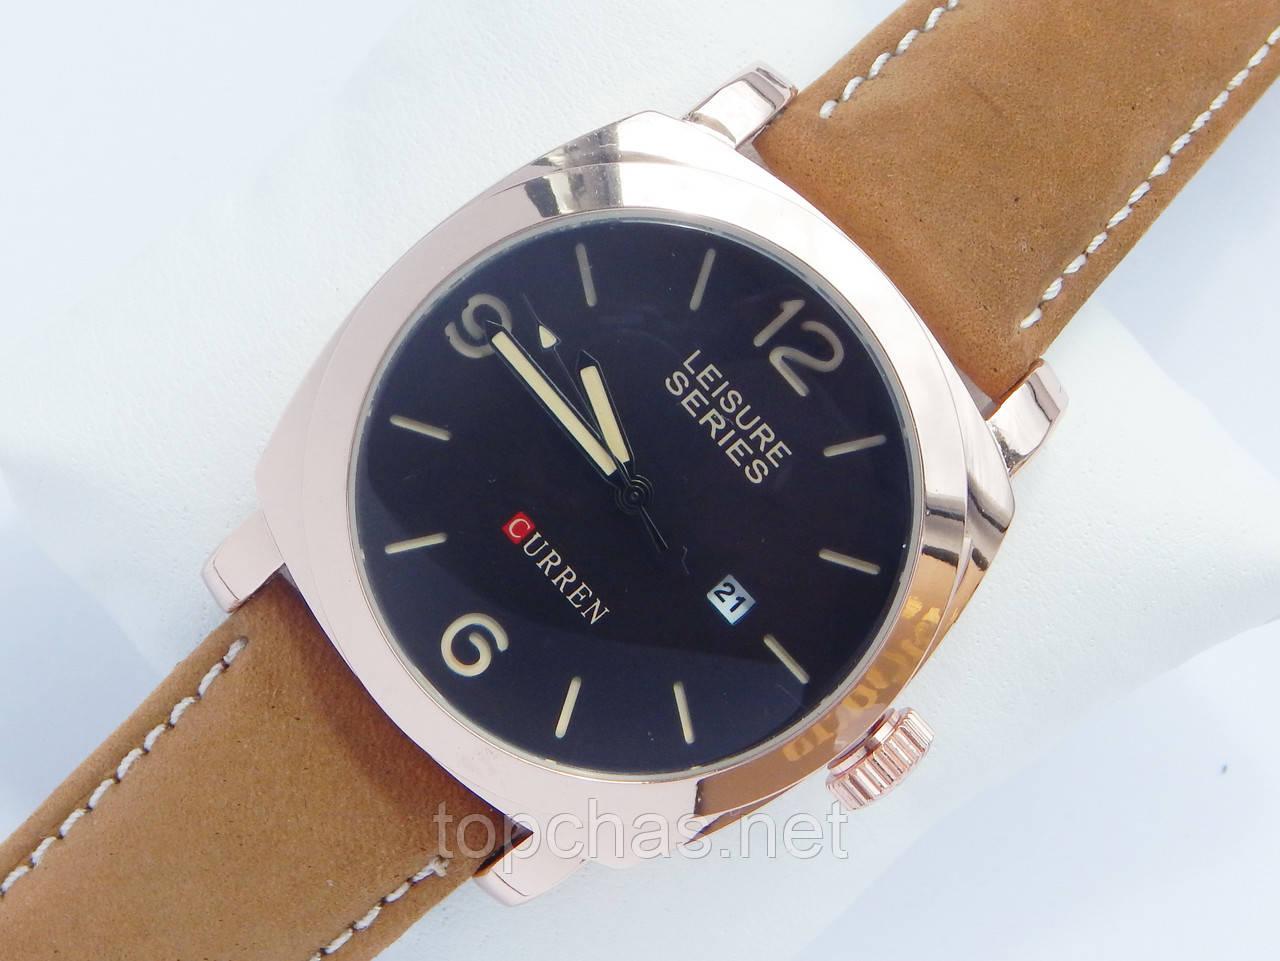 Мужские кварцевые наручные часы Curren Leisure Series, фото 1